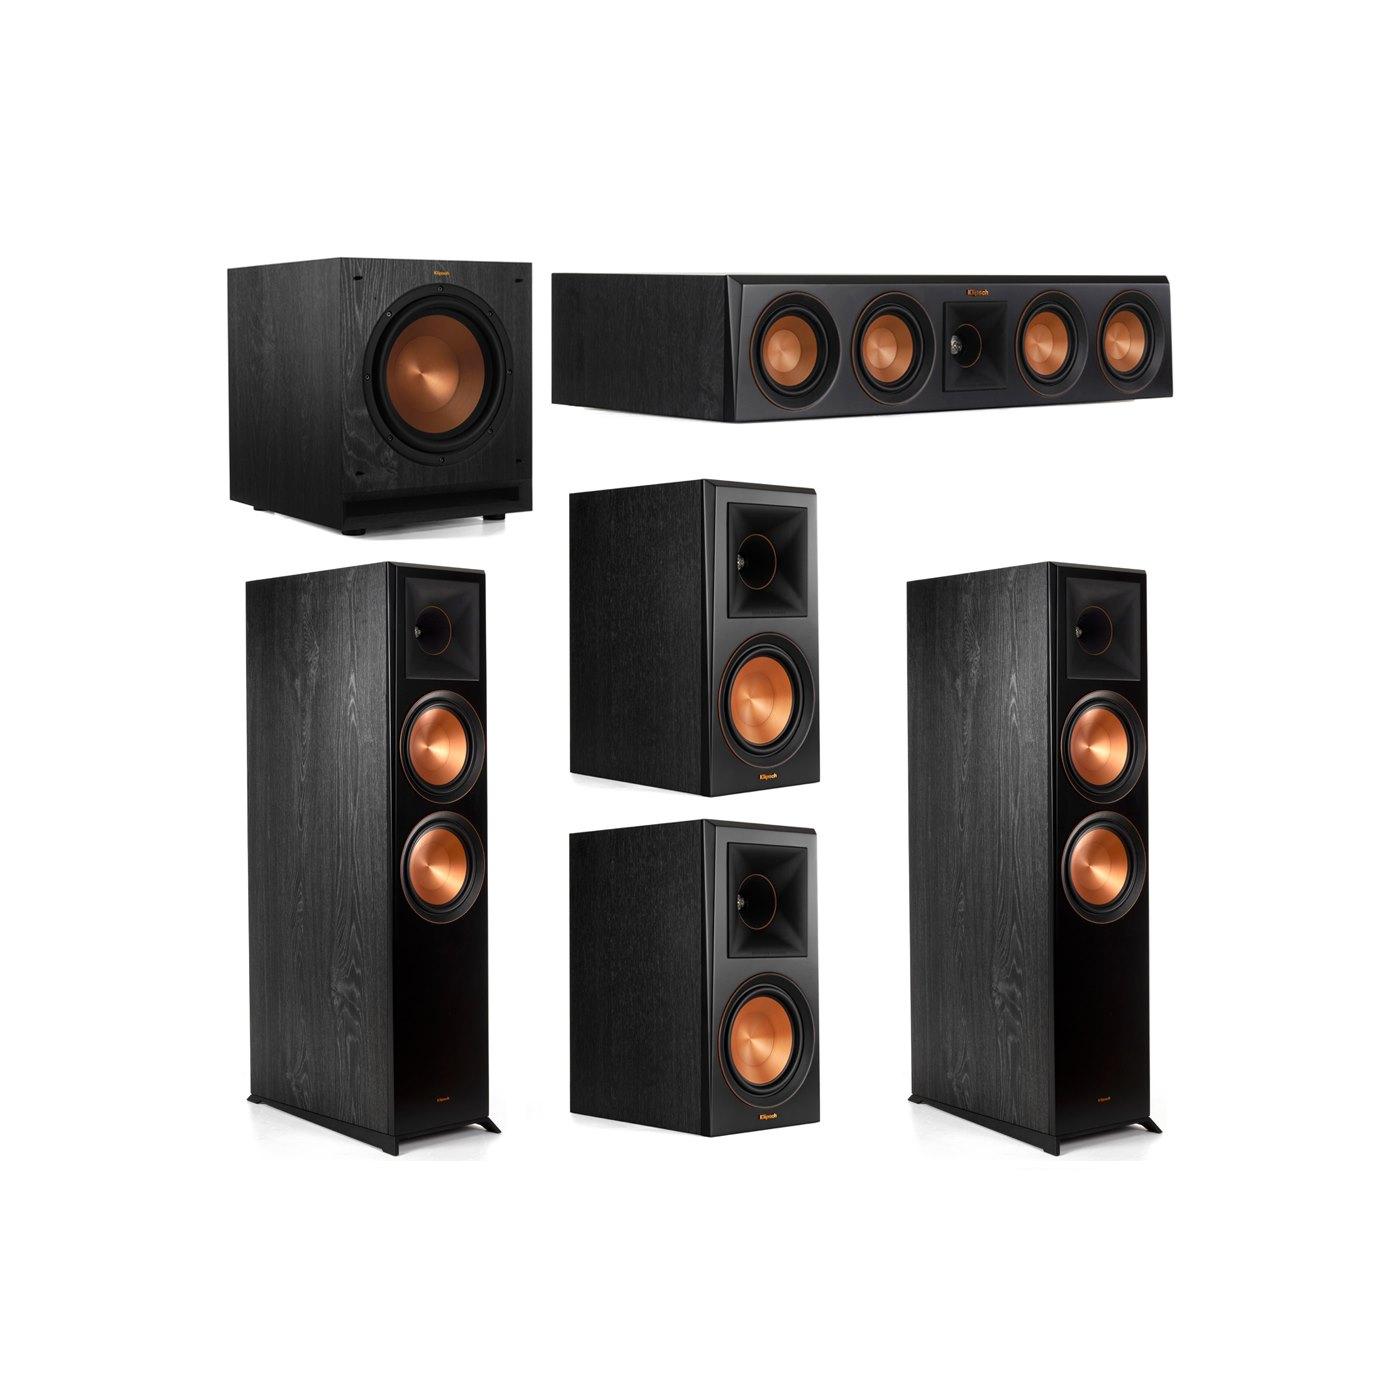 Klipsch 5.1 System with 2 RP-8000F Floorstanding Speakers, 1 Klipsch RP-404C Center Speaker, 2 Klipsch RP-600M Surround Speakers, 1 Klipsch SPL-100 Subwoofer